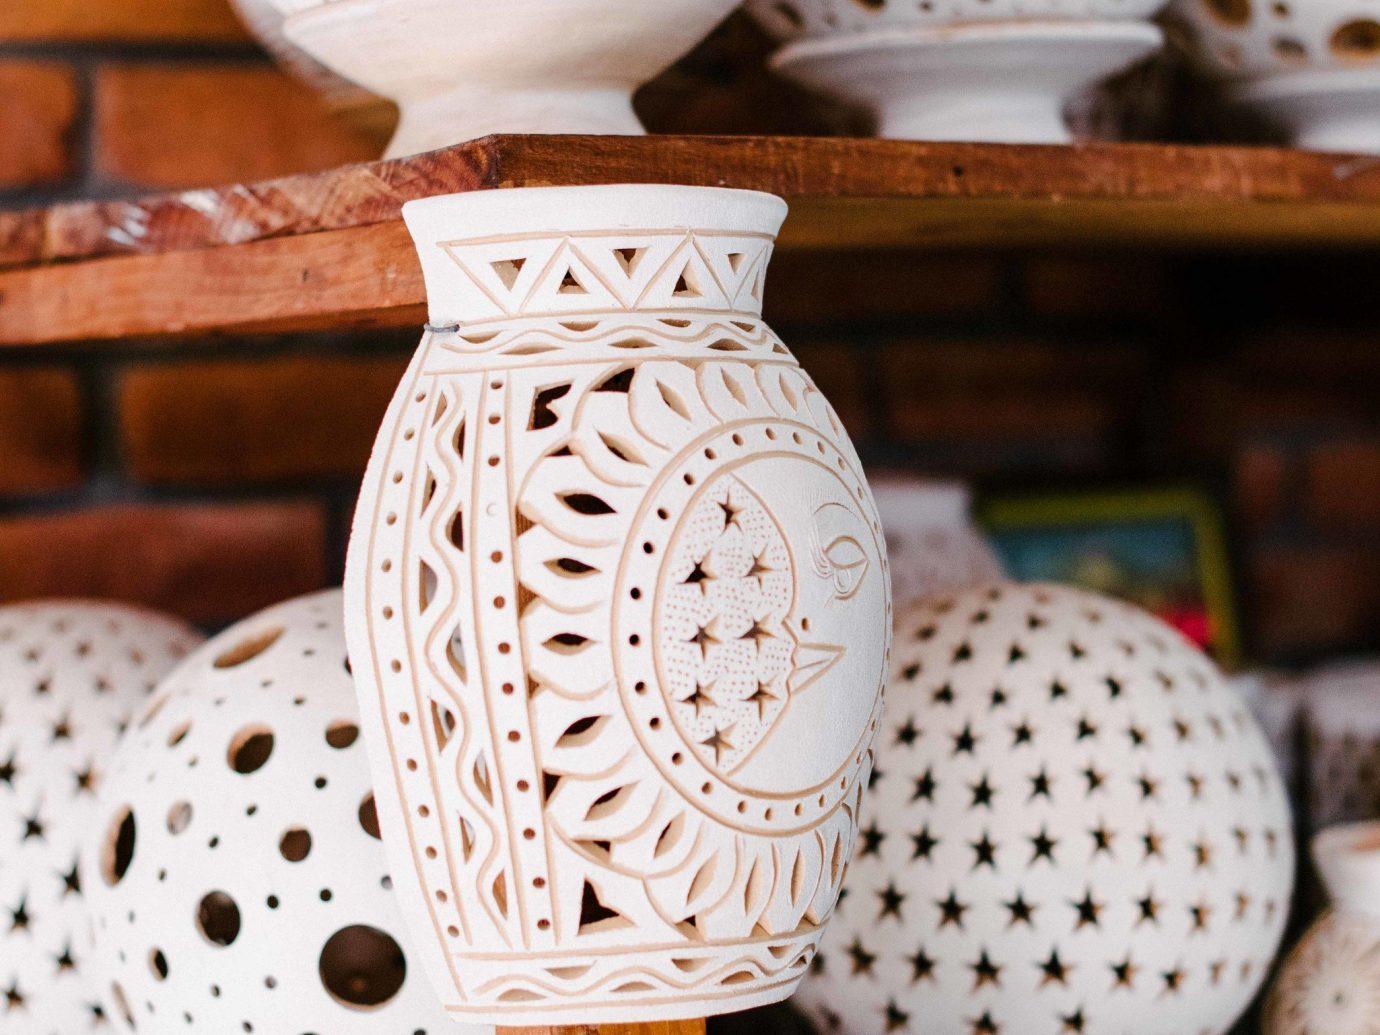 Arts + Culture Mexico Oaxaca Trip Ideas indoor ceramic lighting accessory porcelain